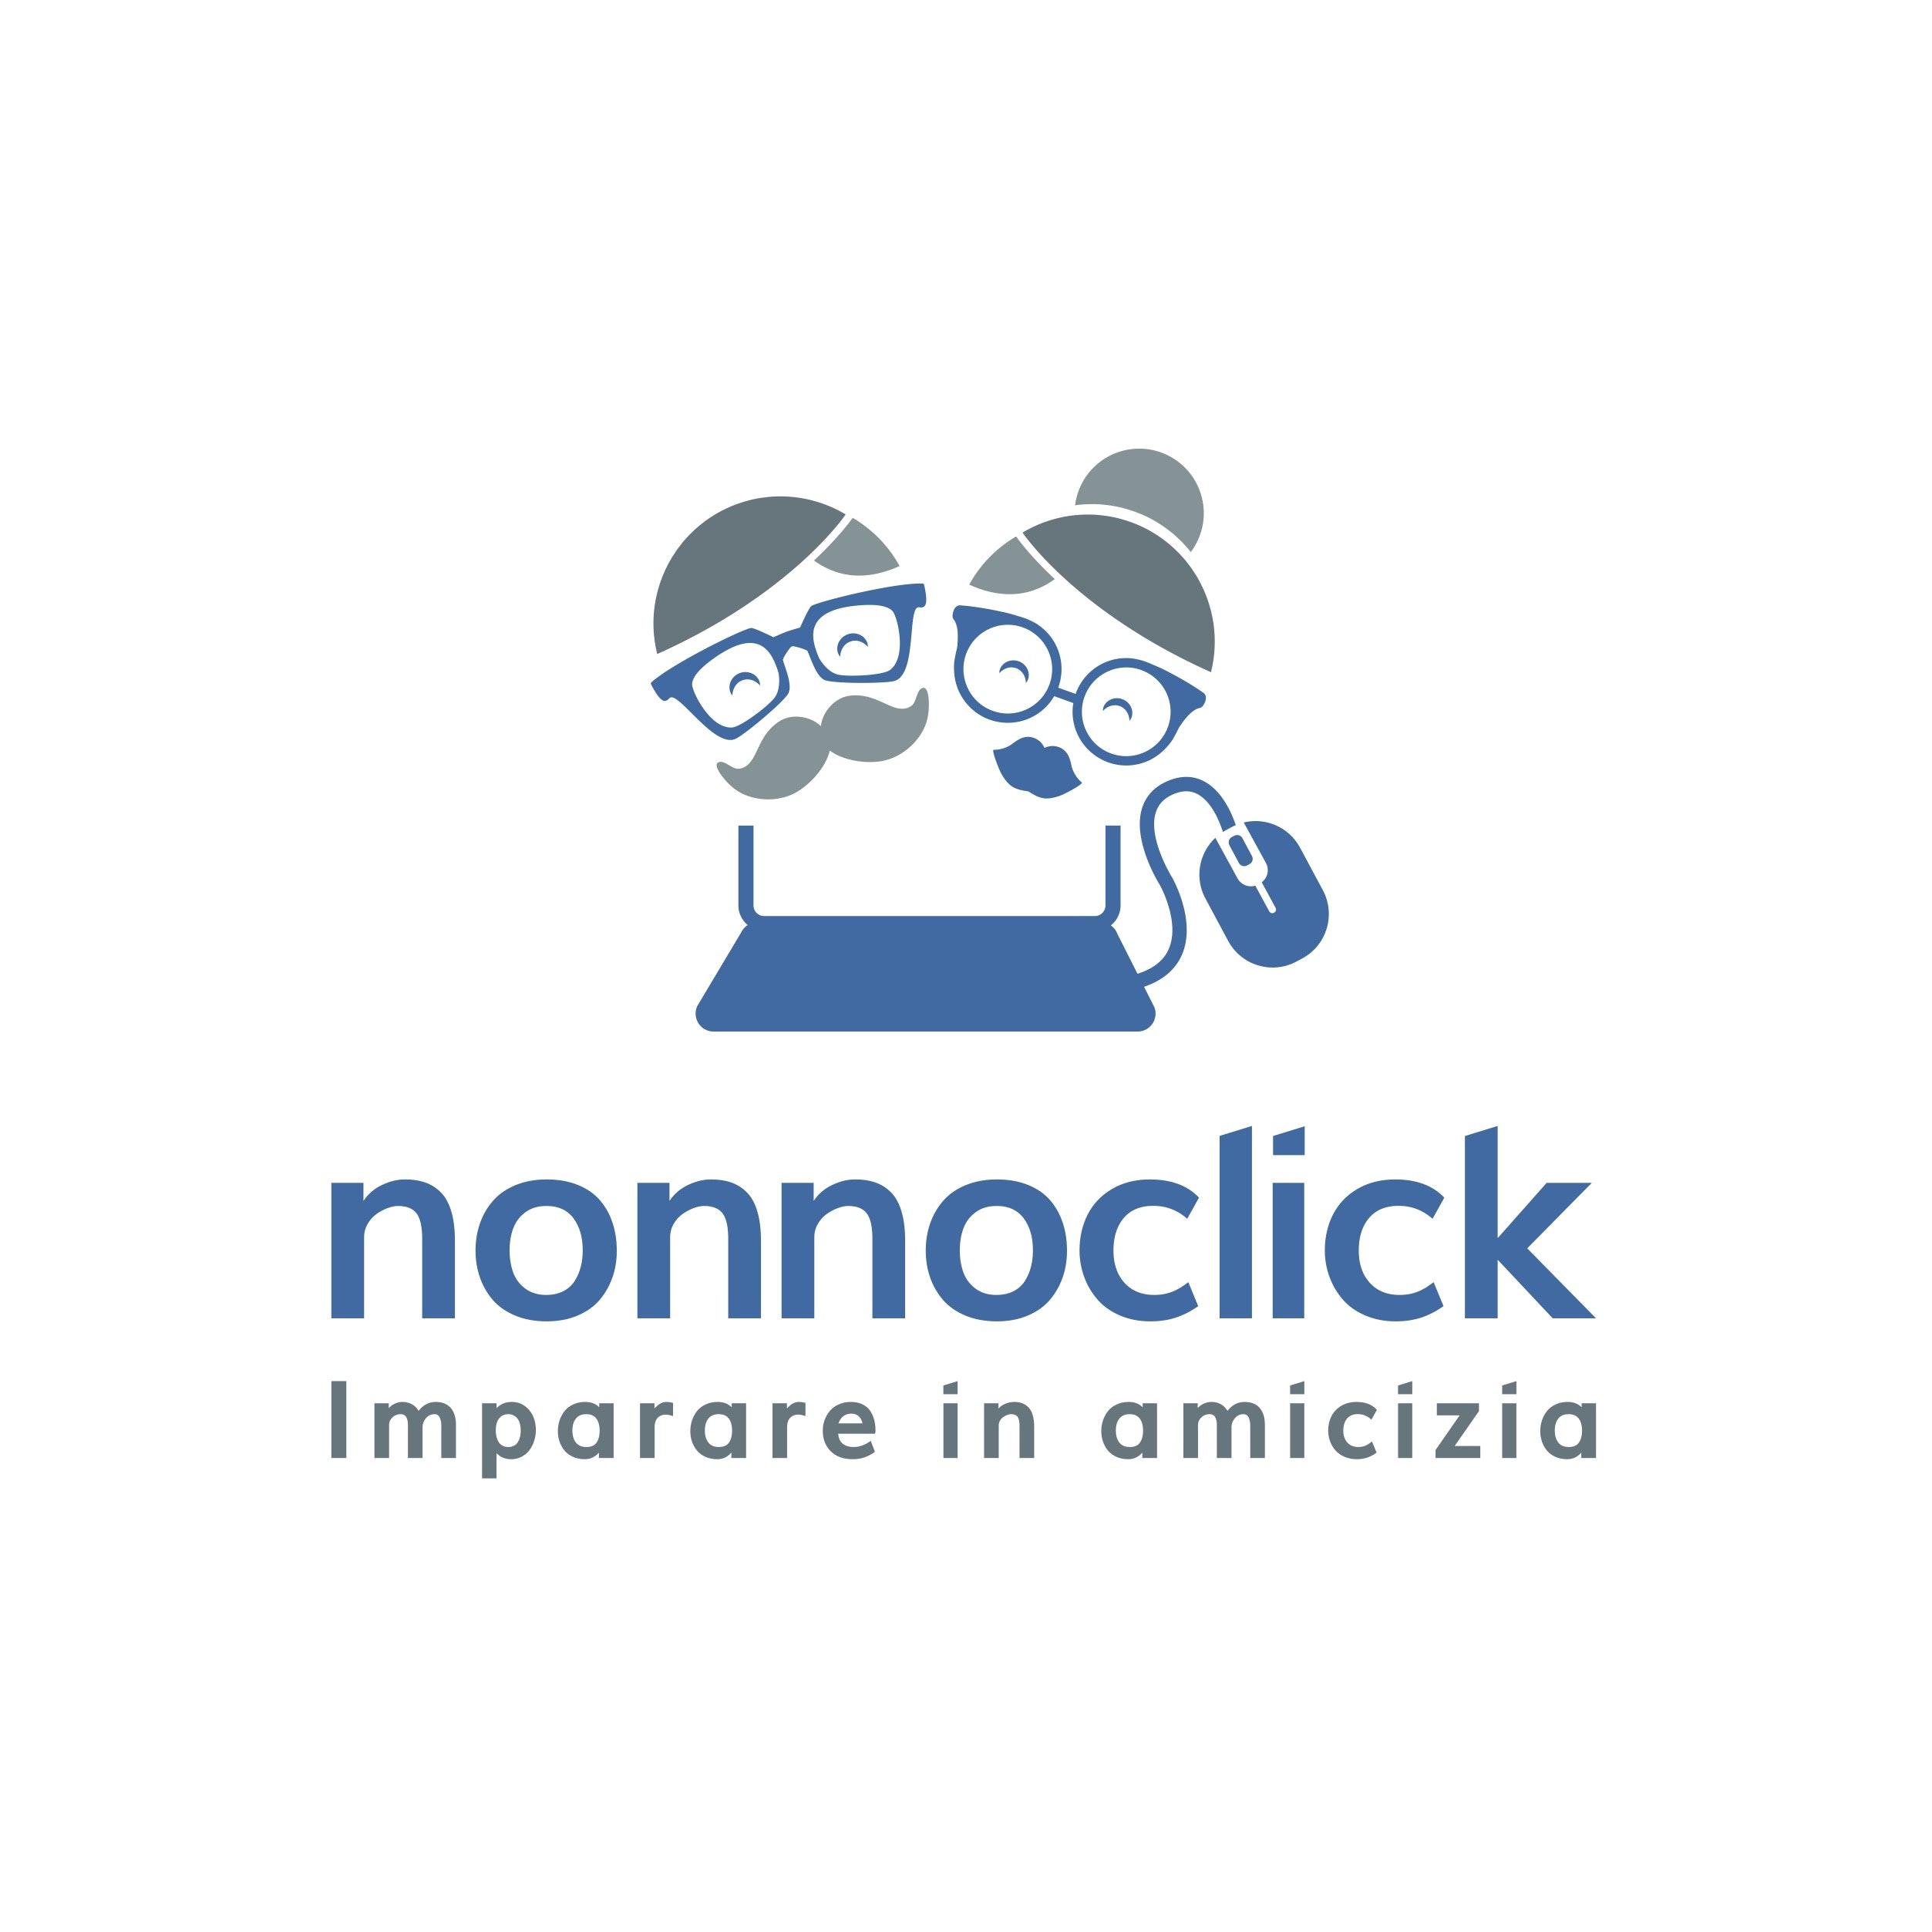 1499779016118293 nonnoclick logo 03 stampa